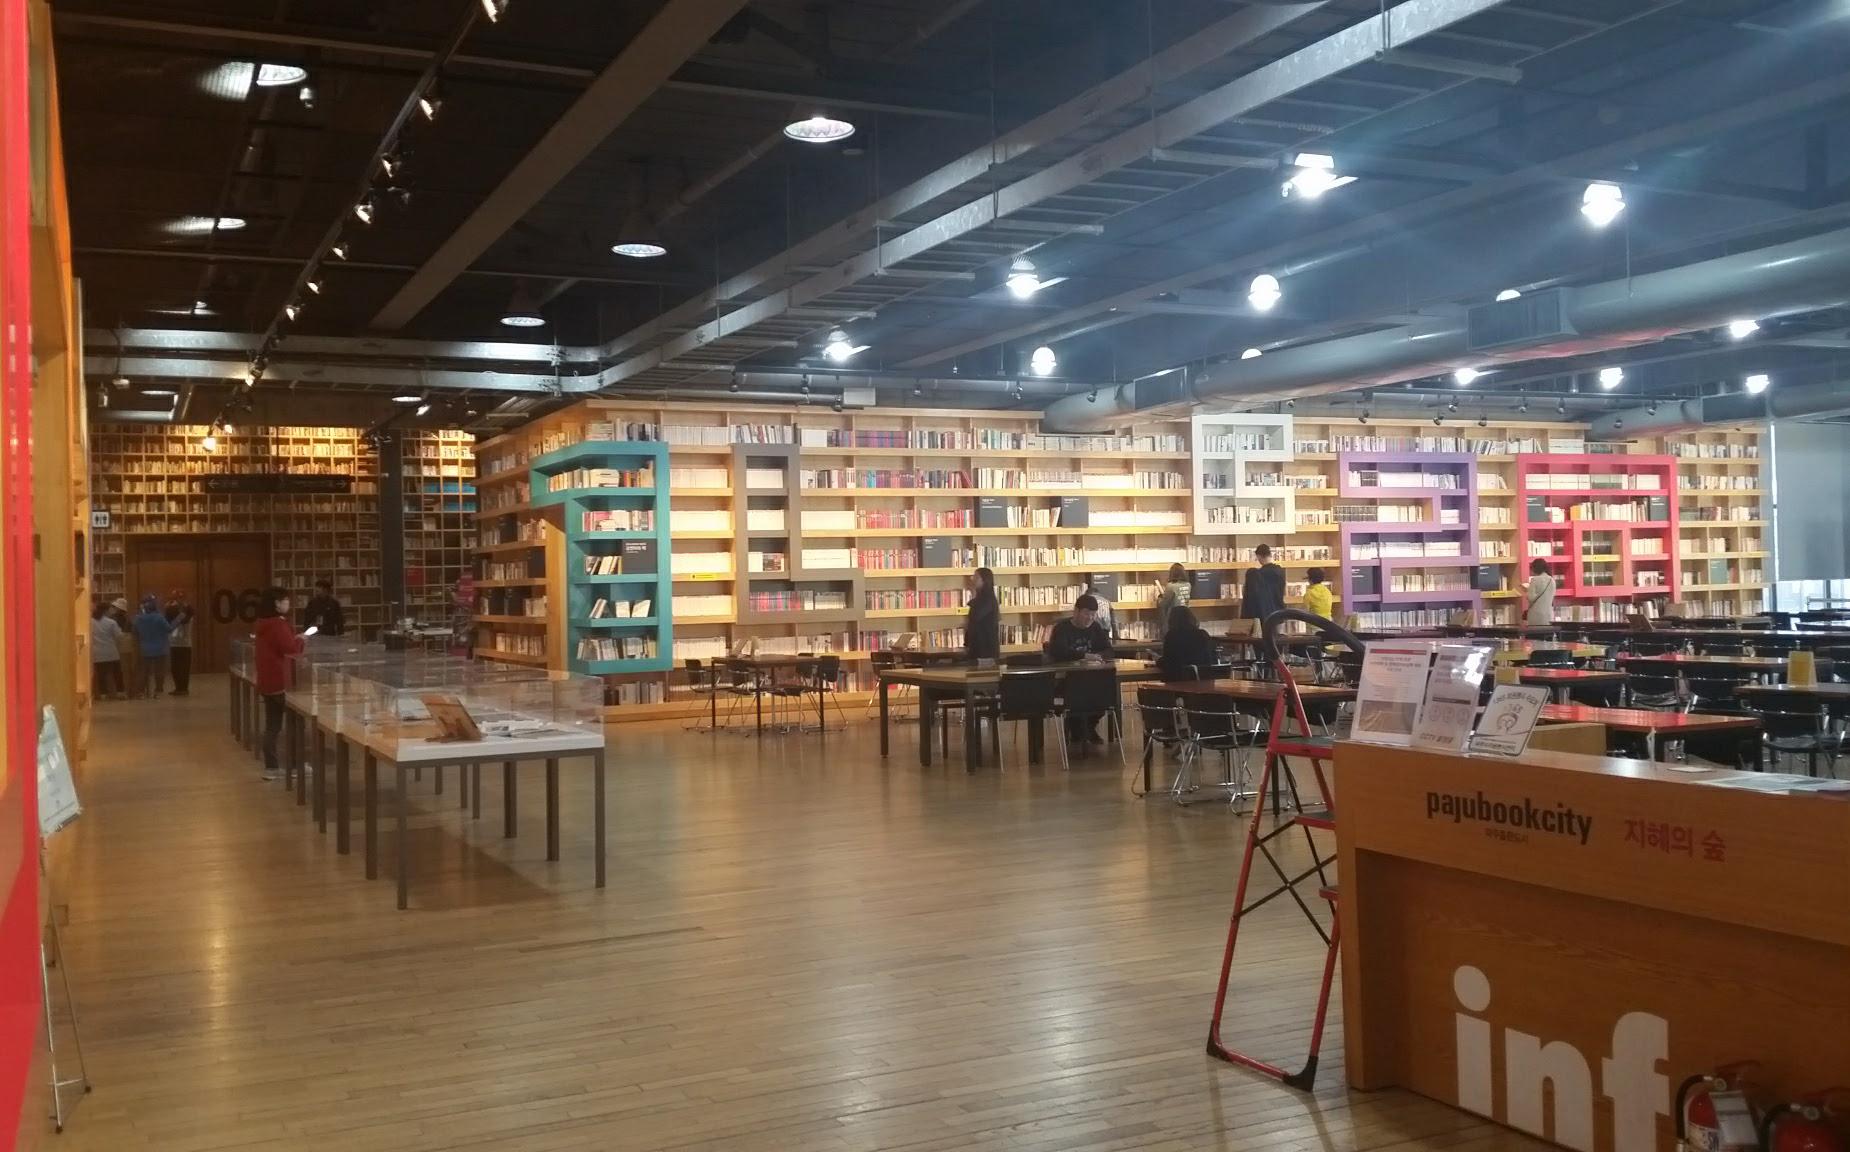 Paju - Book City